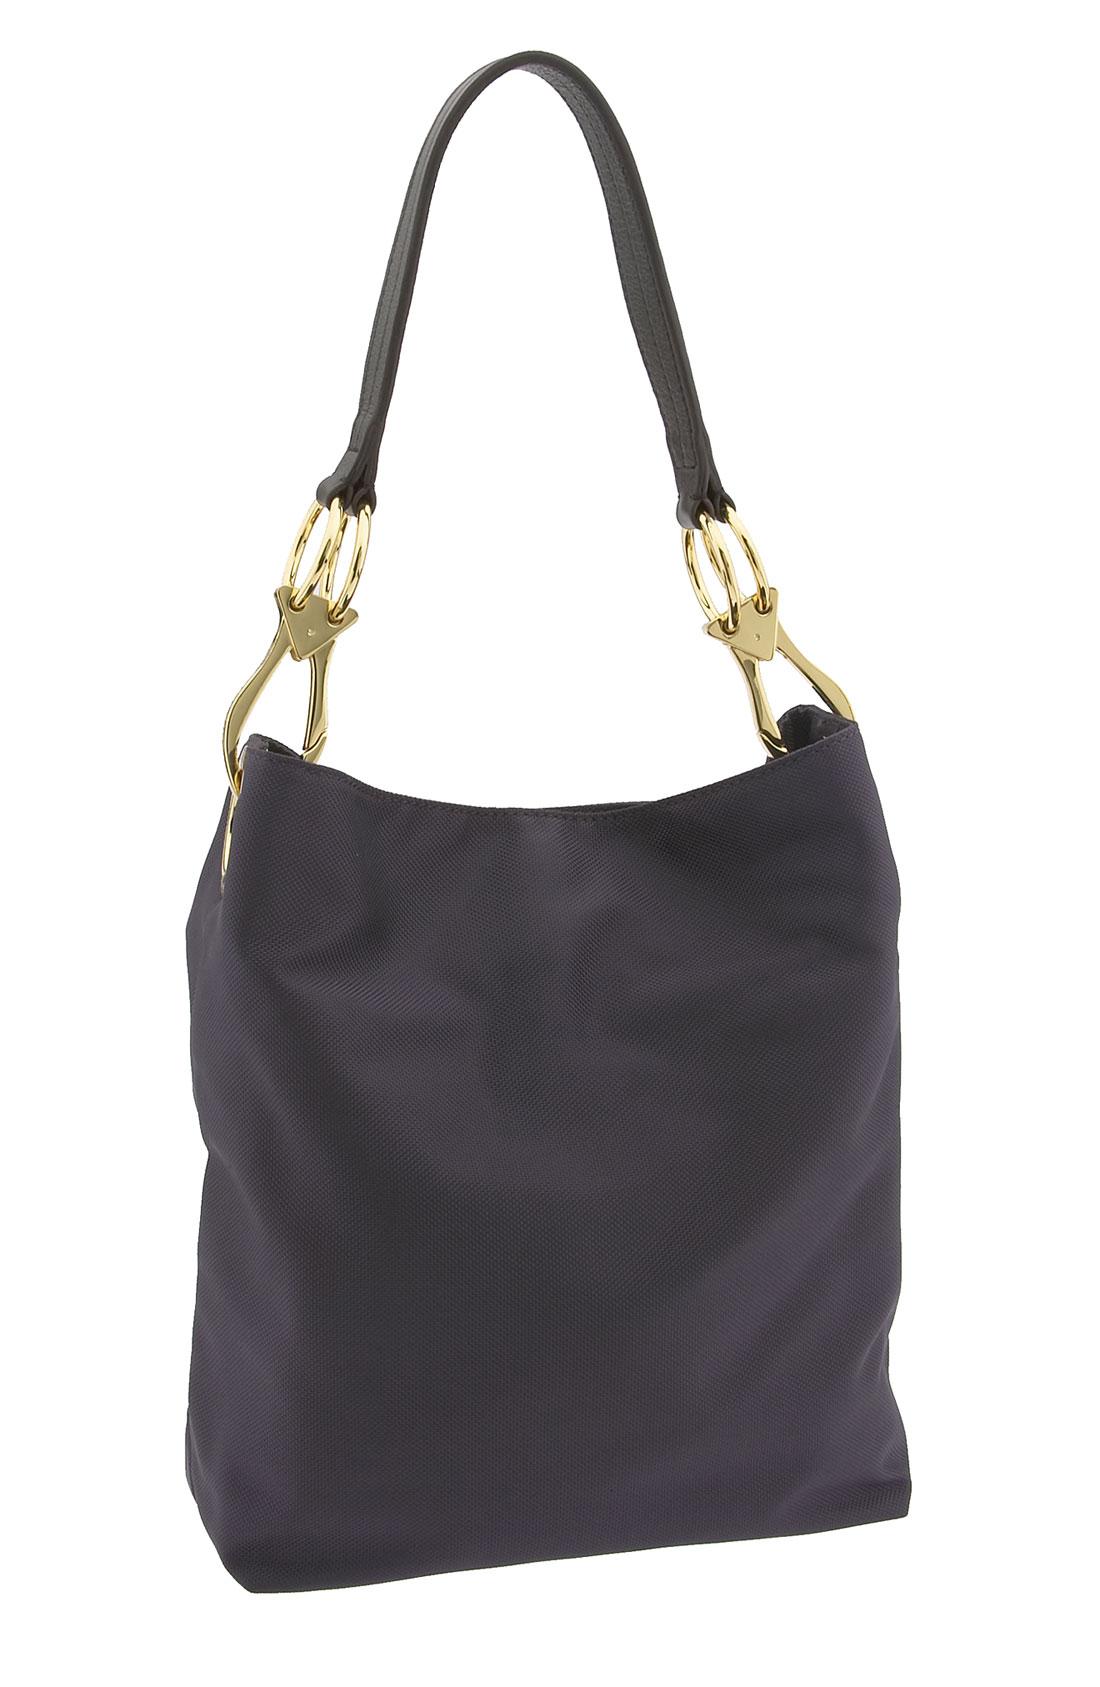 jpk paris nylon bucket bag with chunky hardware in purple eggplant lyst. Black Bedroom Furniture Sets. Home Design Ideas